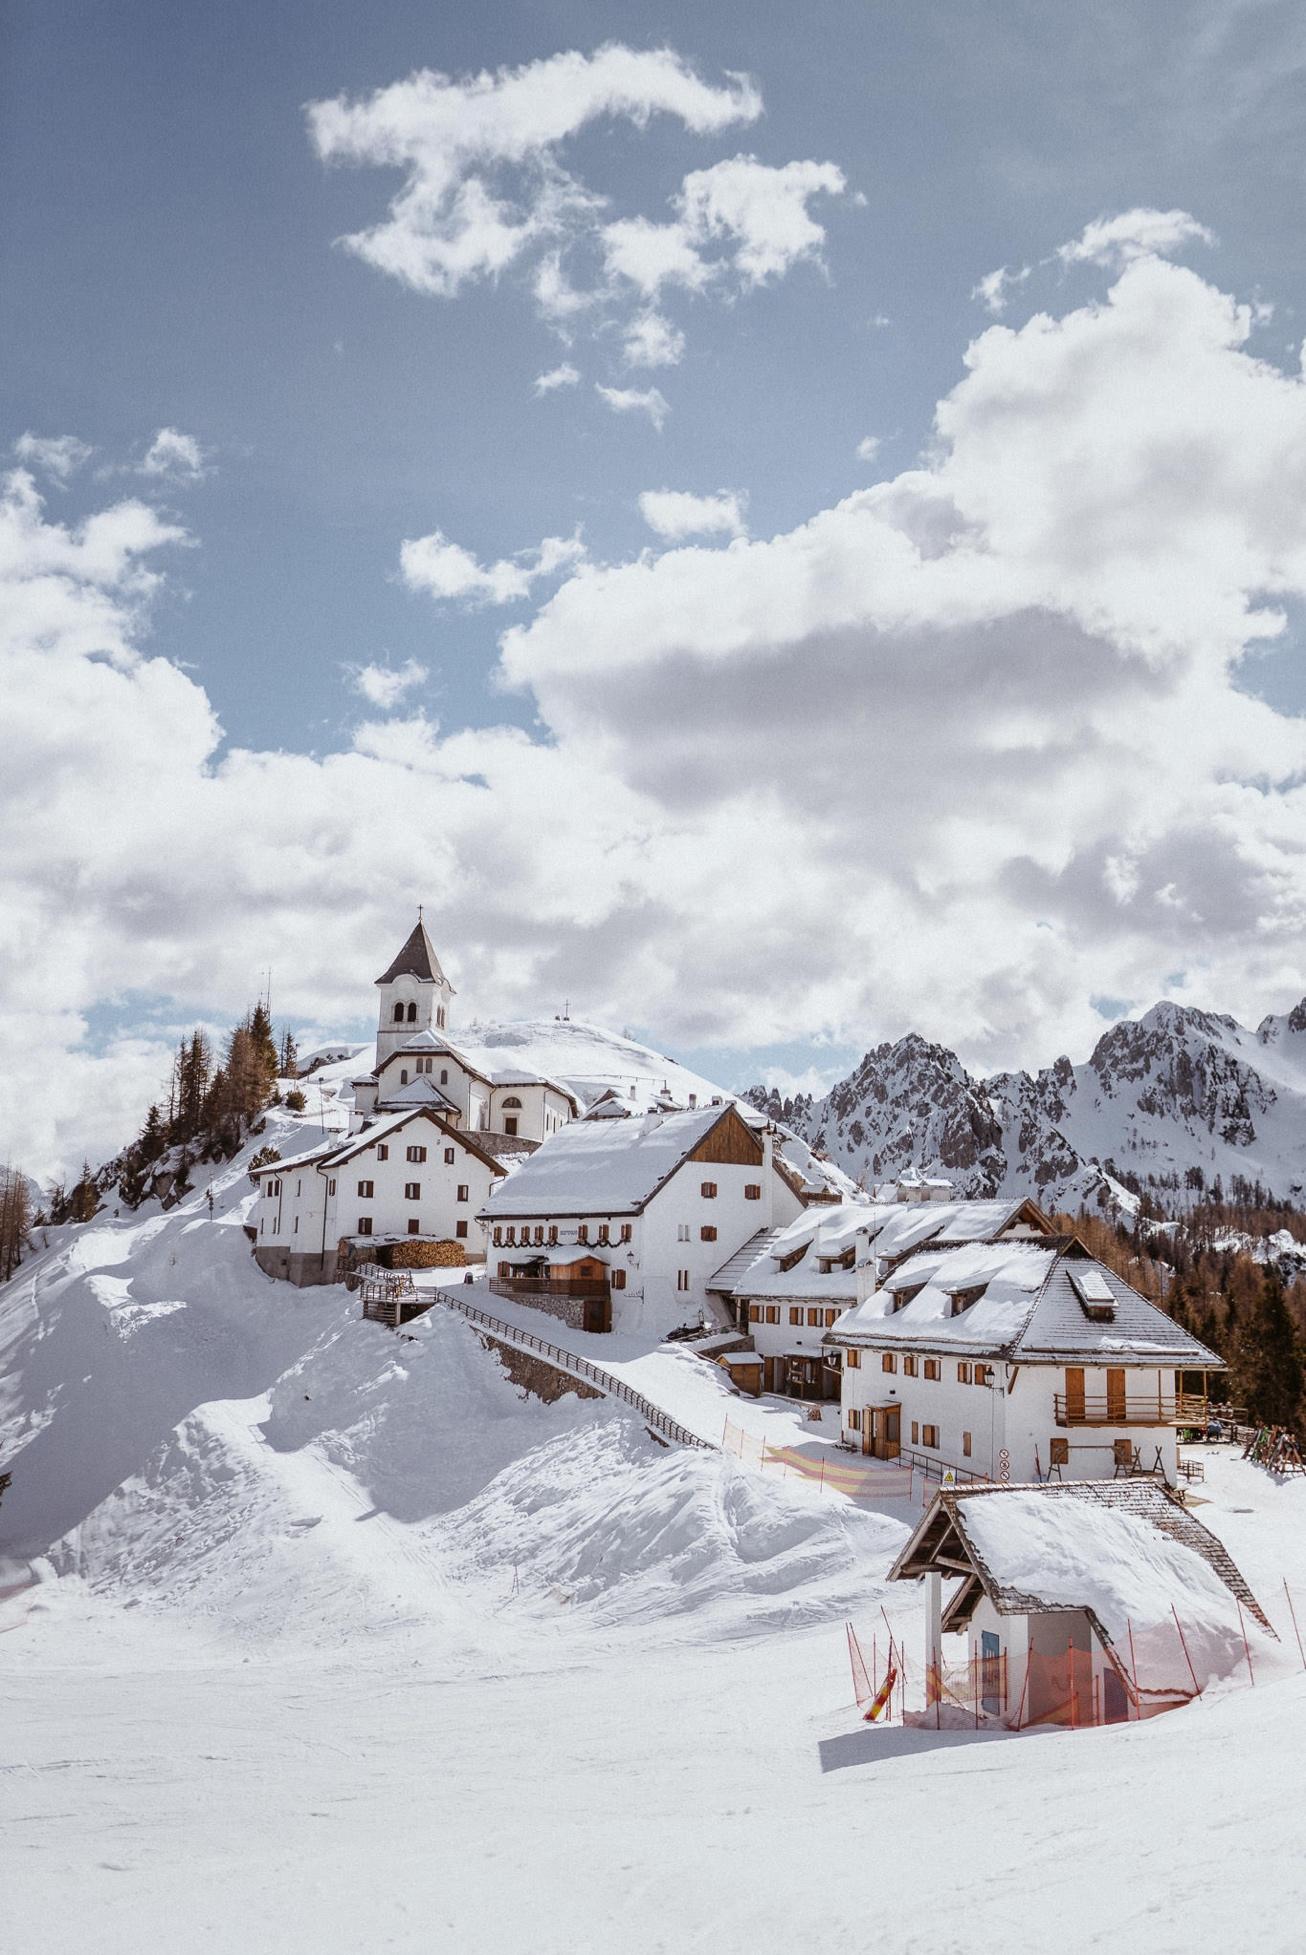 29 Višarje snowboard izlet smučanje Svete Monte Lussari